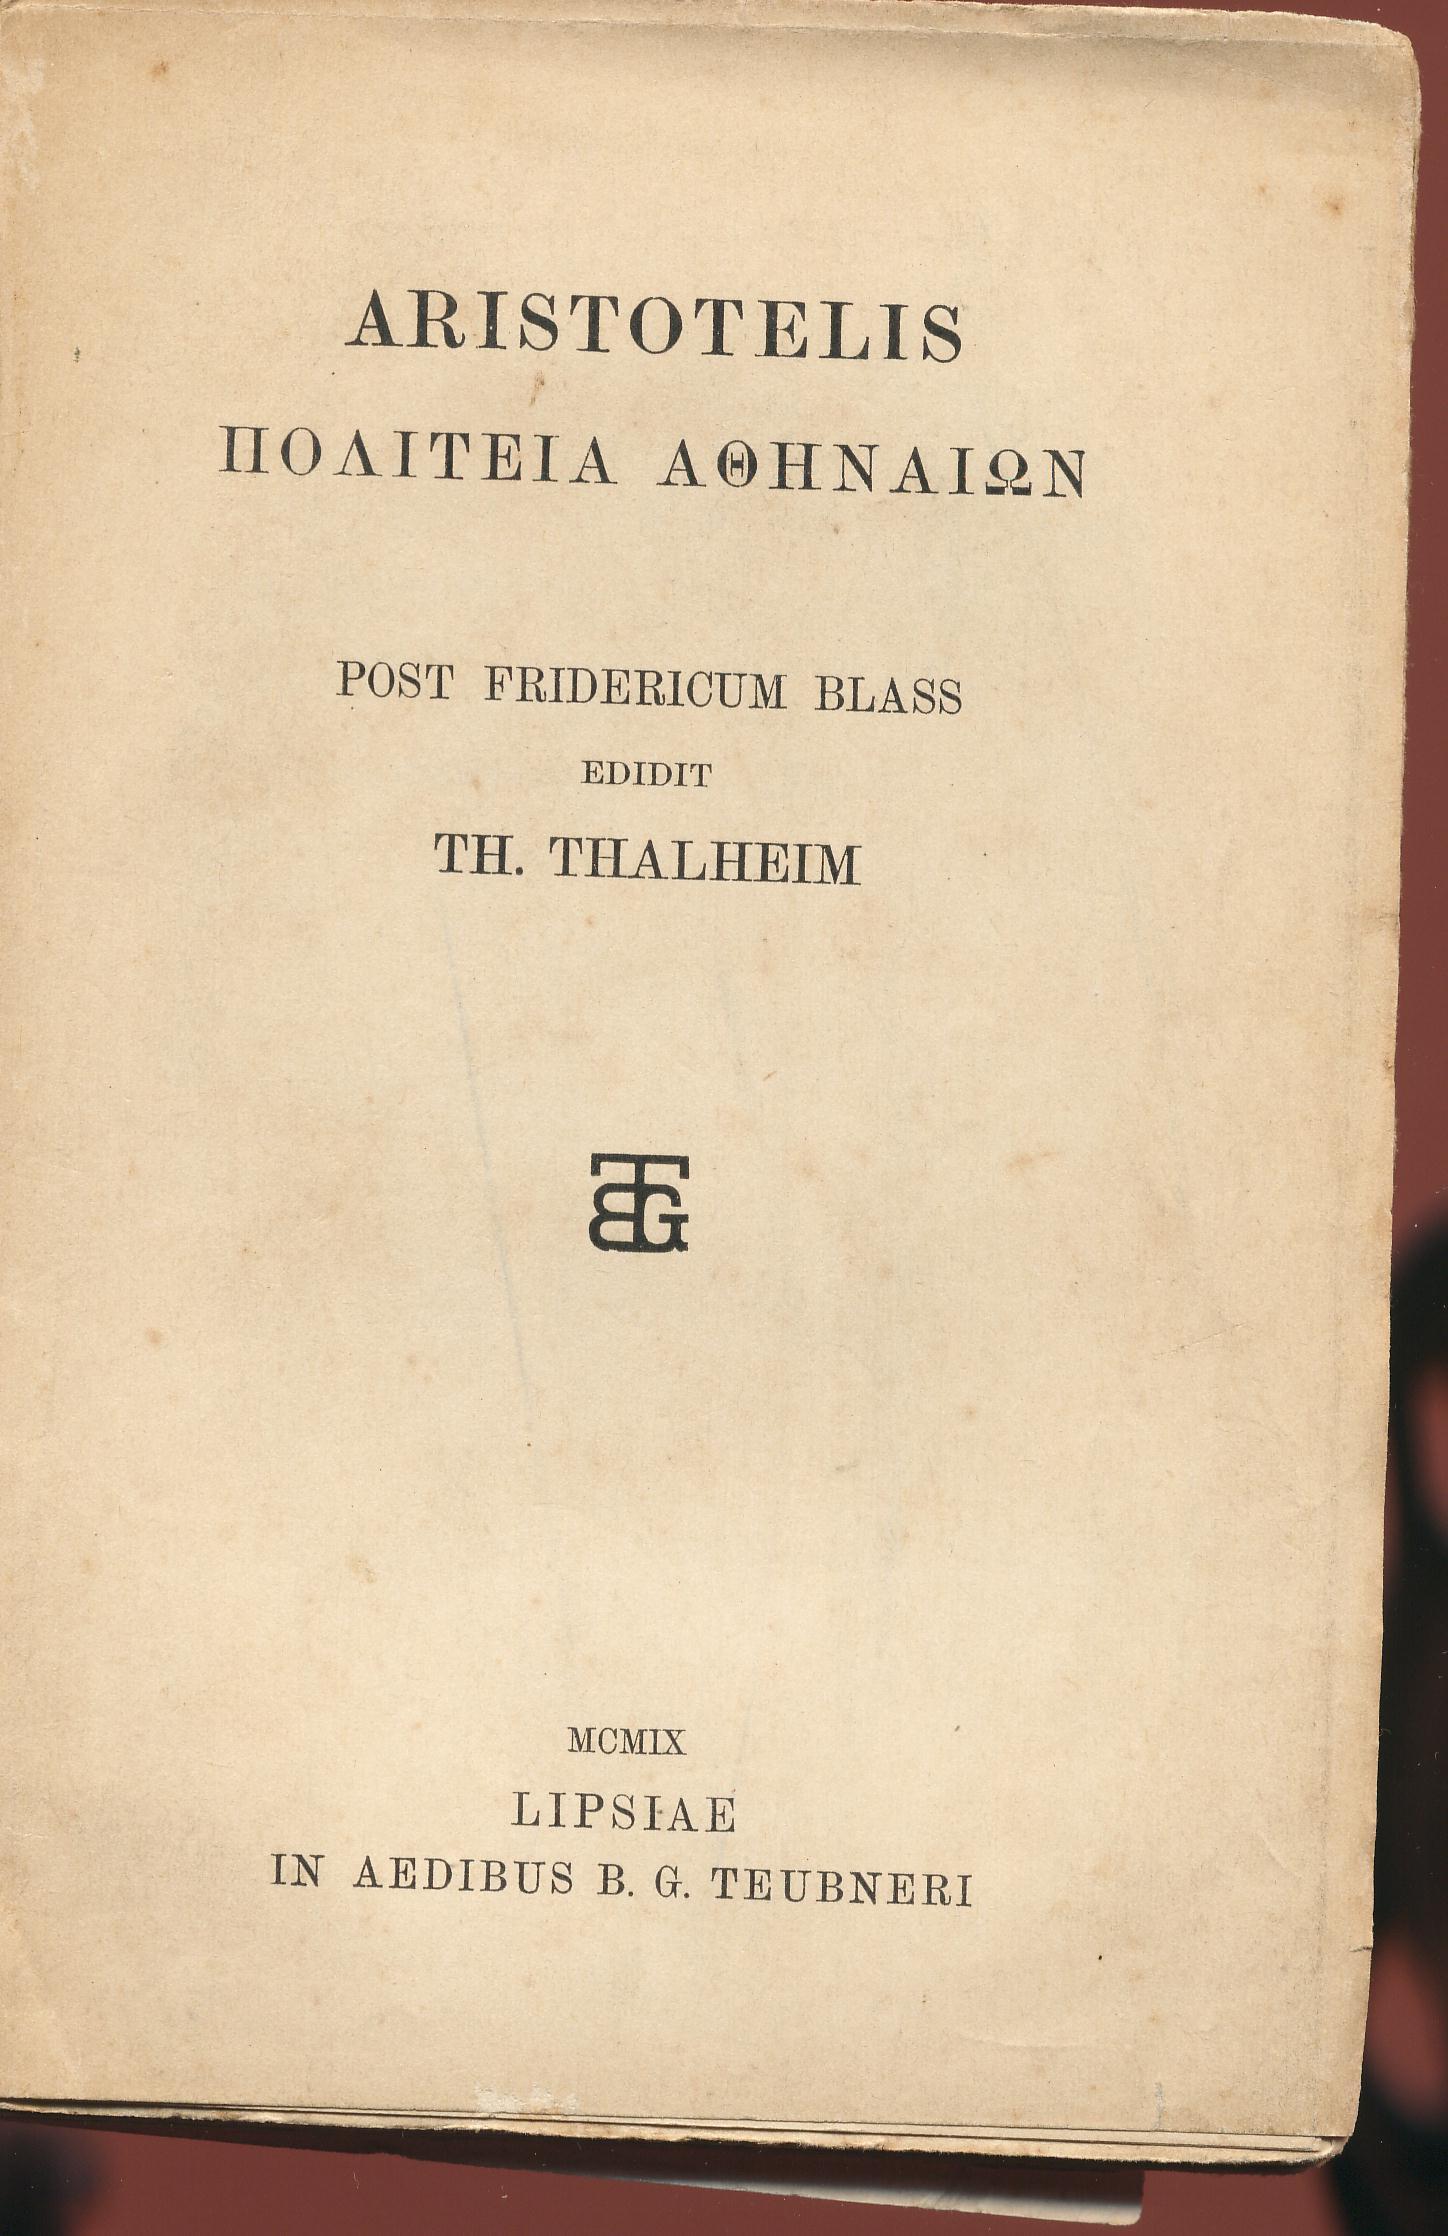 page book aristotelis yellow paper print themabina